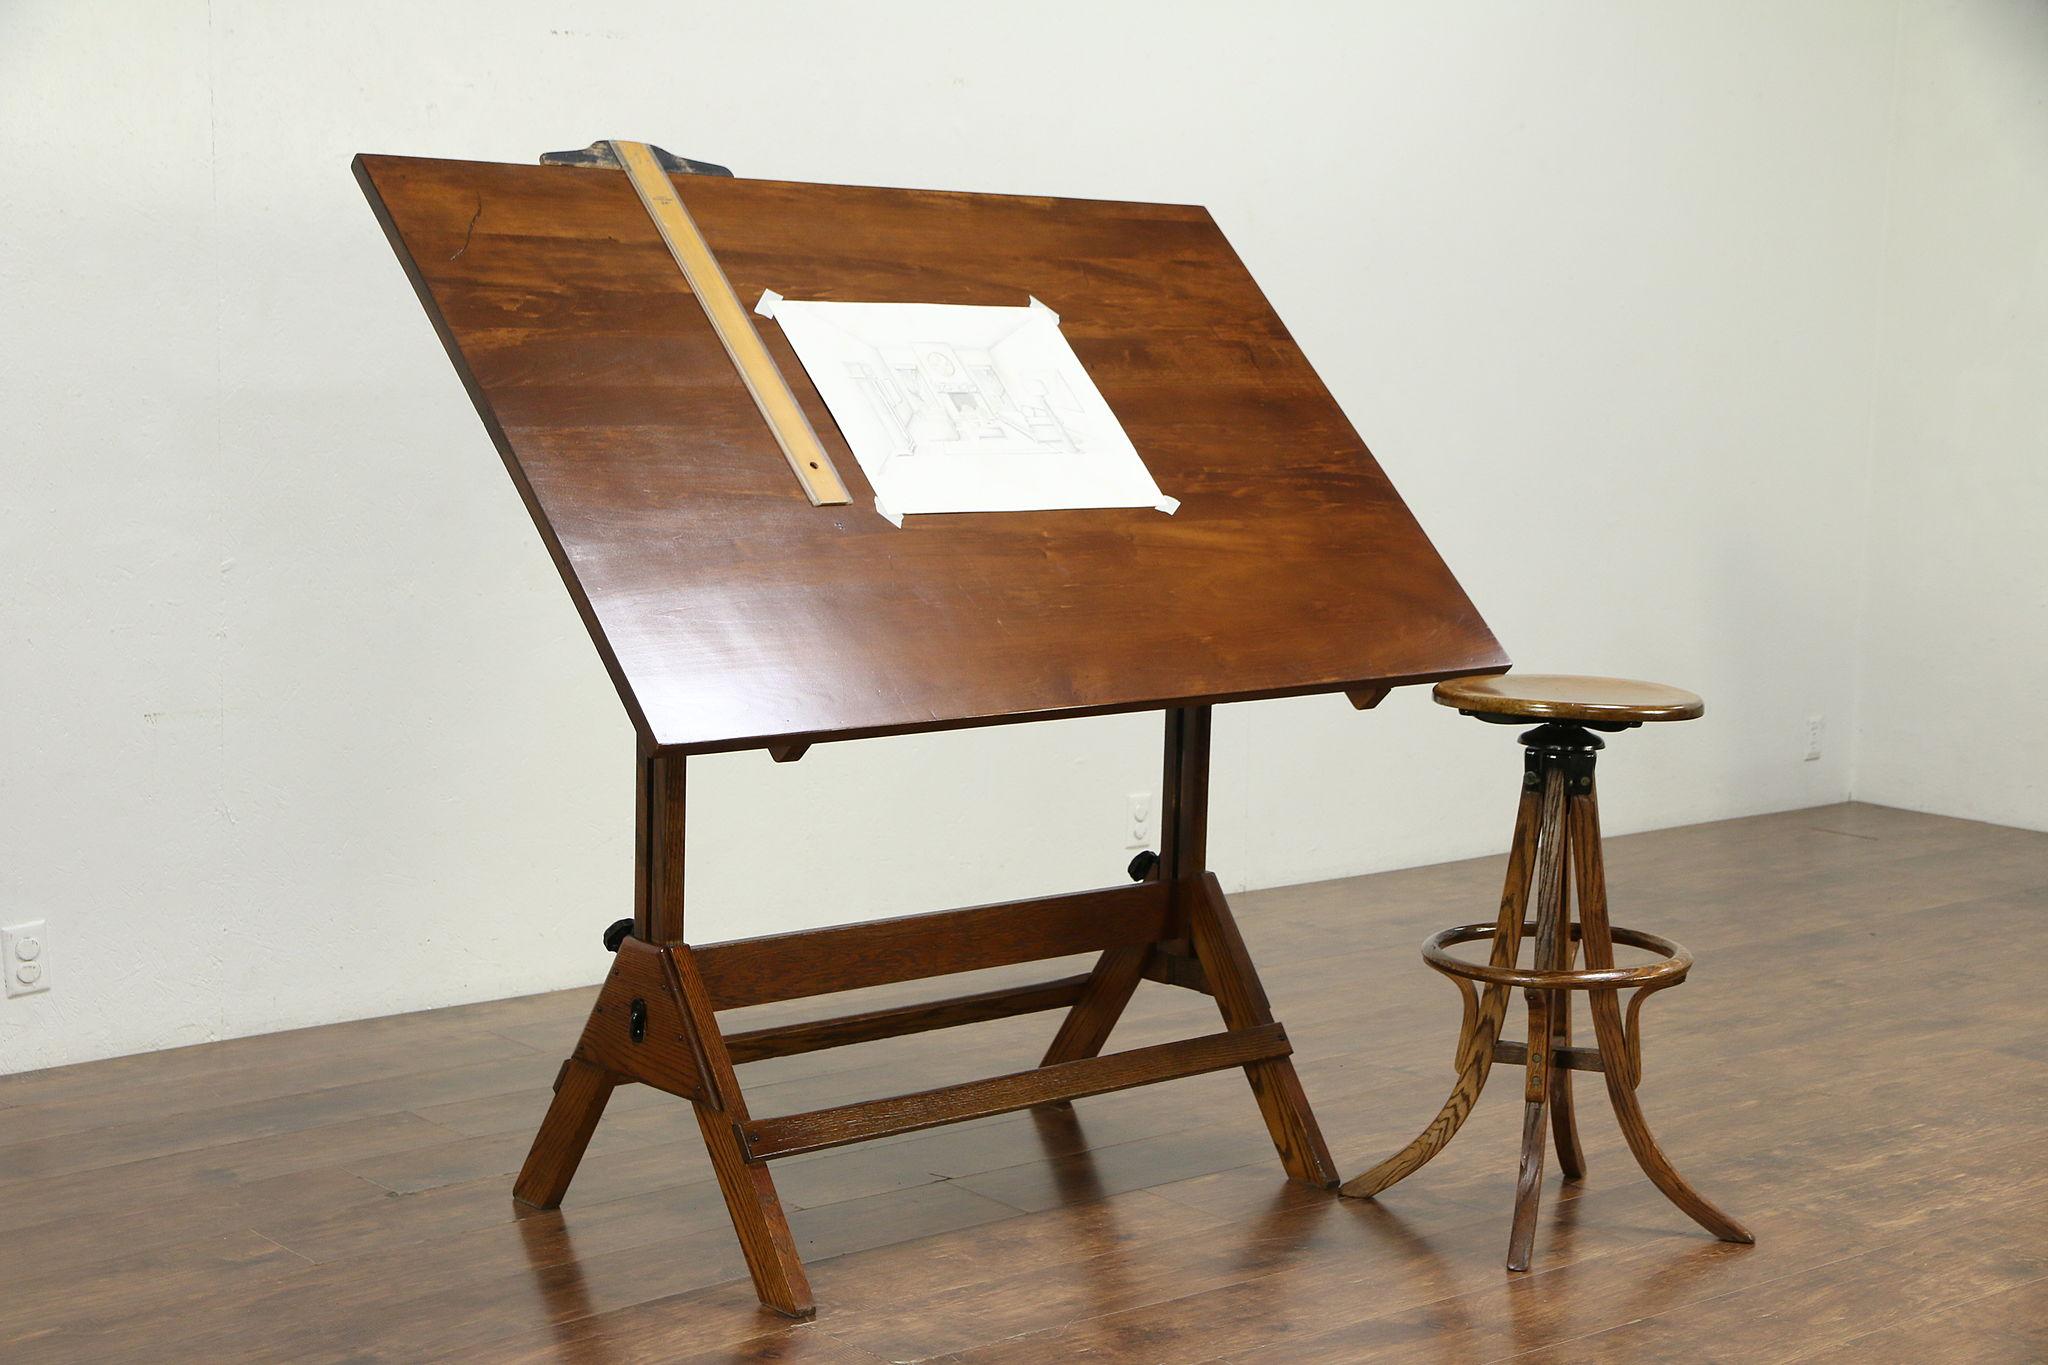 Sold Drafting Or Artist Vintage Desk Kitchen Island Wine Table Hamilton 30177 Harp Gallery Antiques Furniture